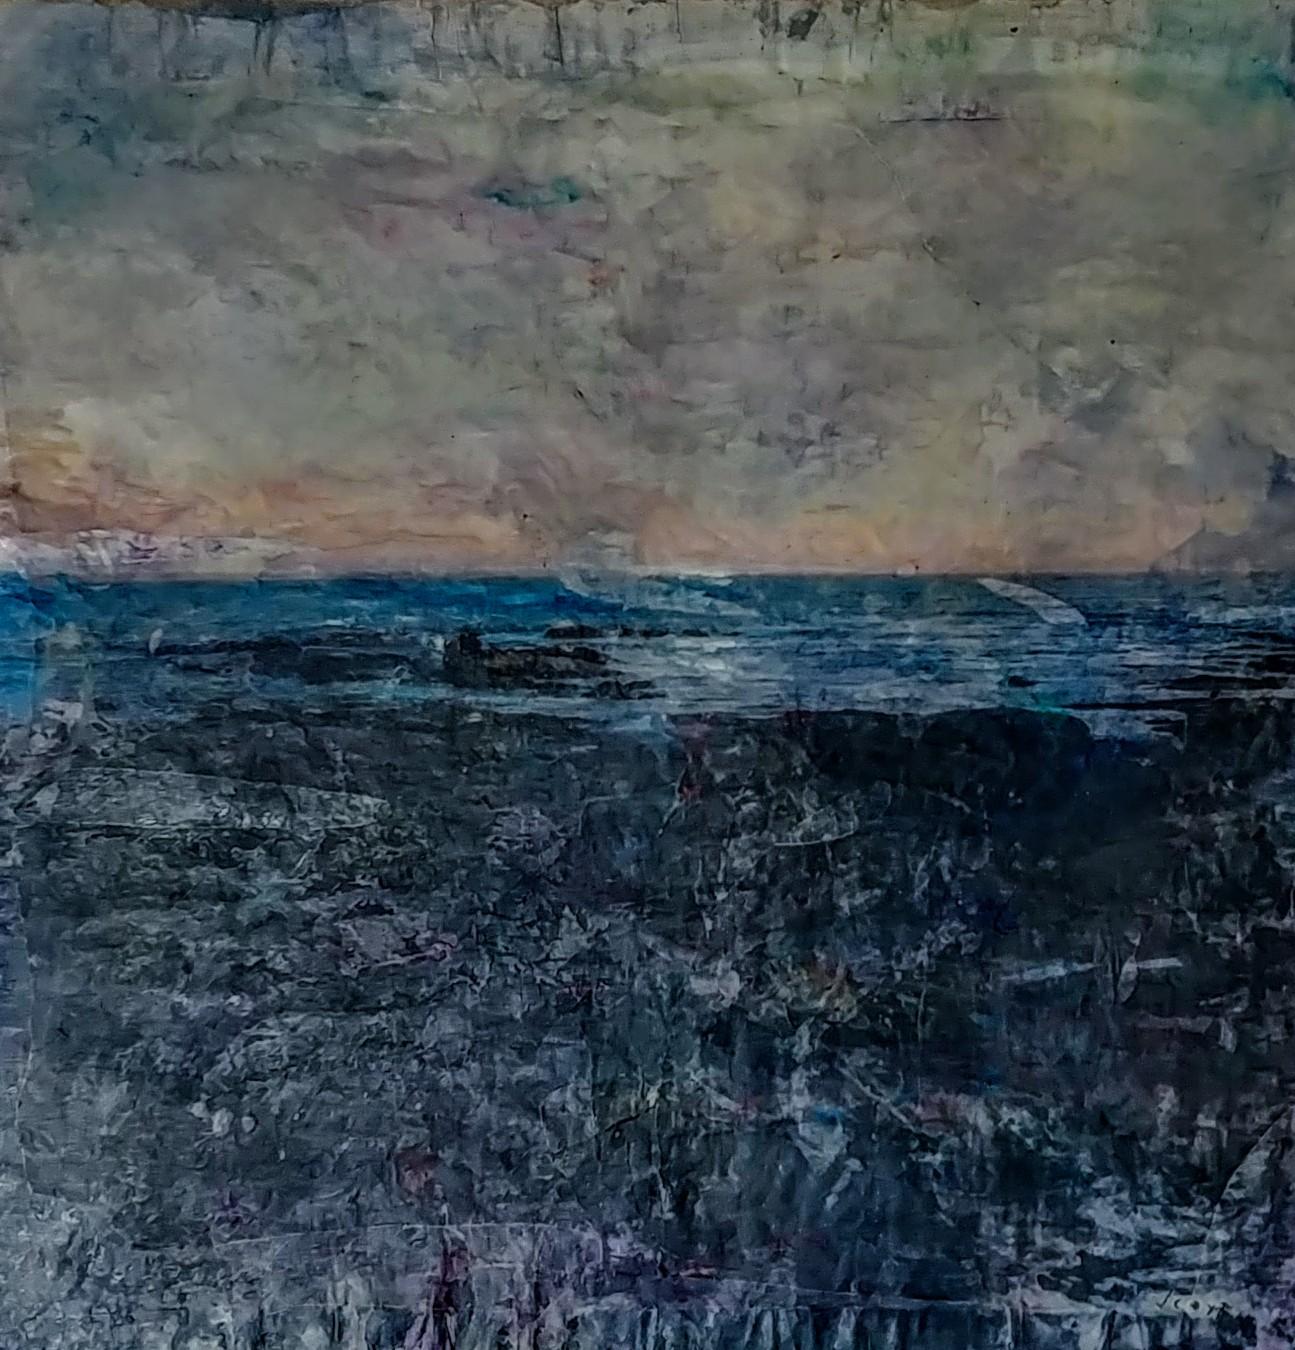 Cusndo el mar duerme (2010) - Jesús Coito Pablo - Jesús Coyto